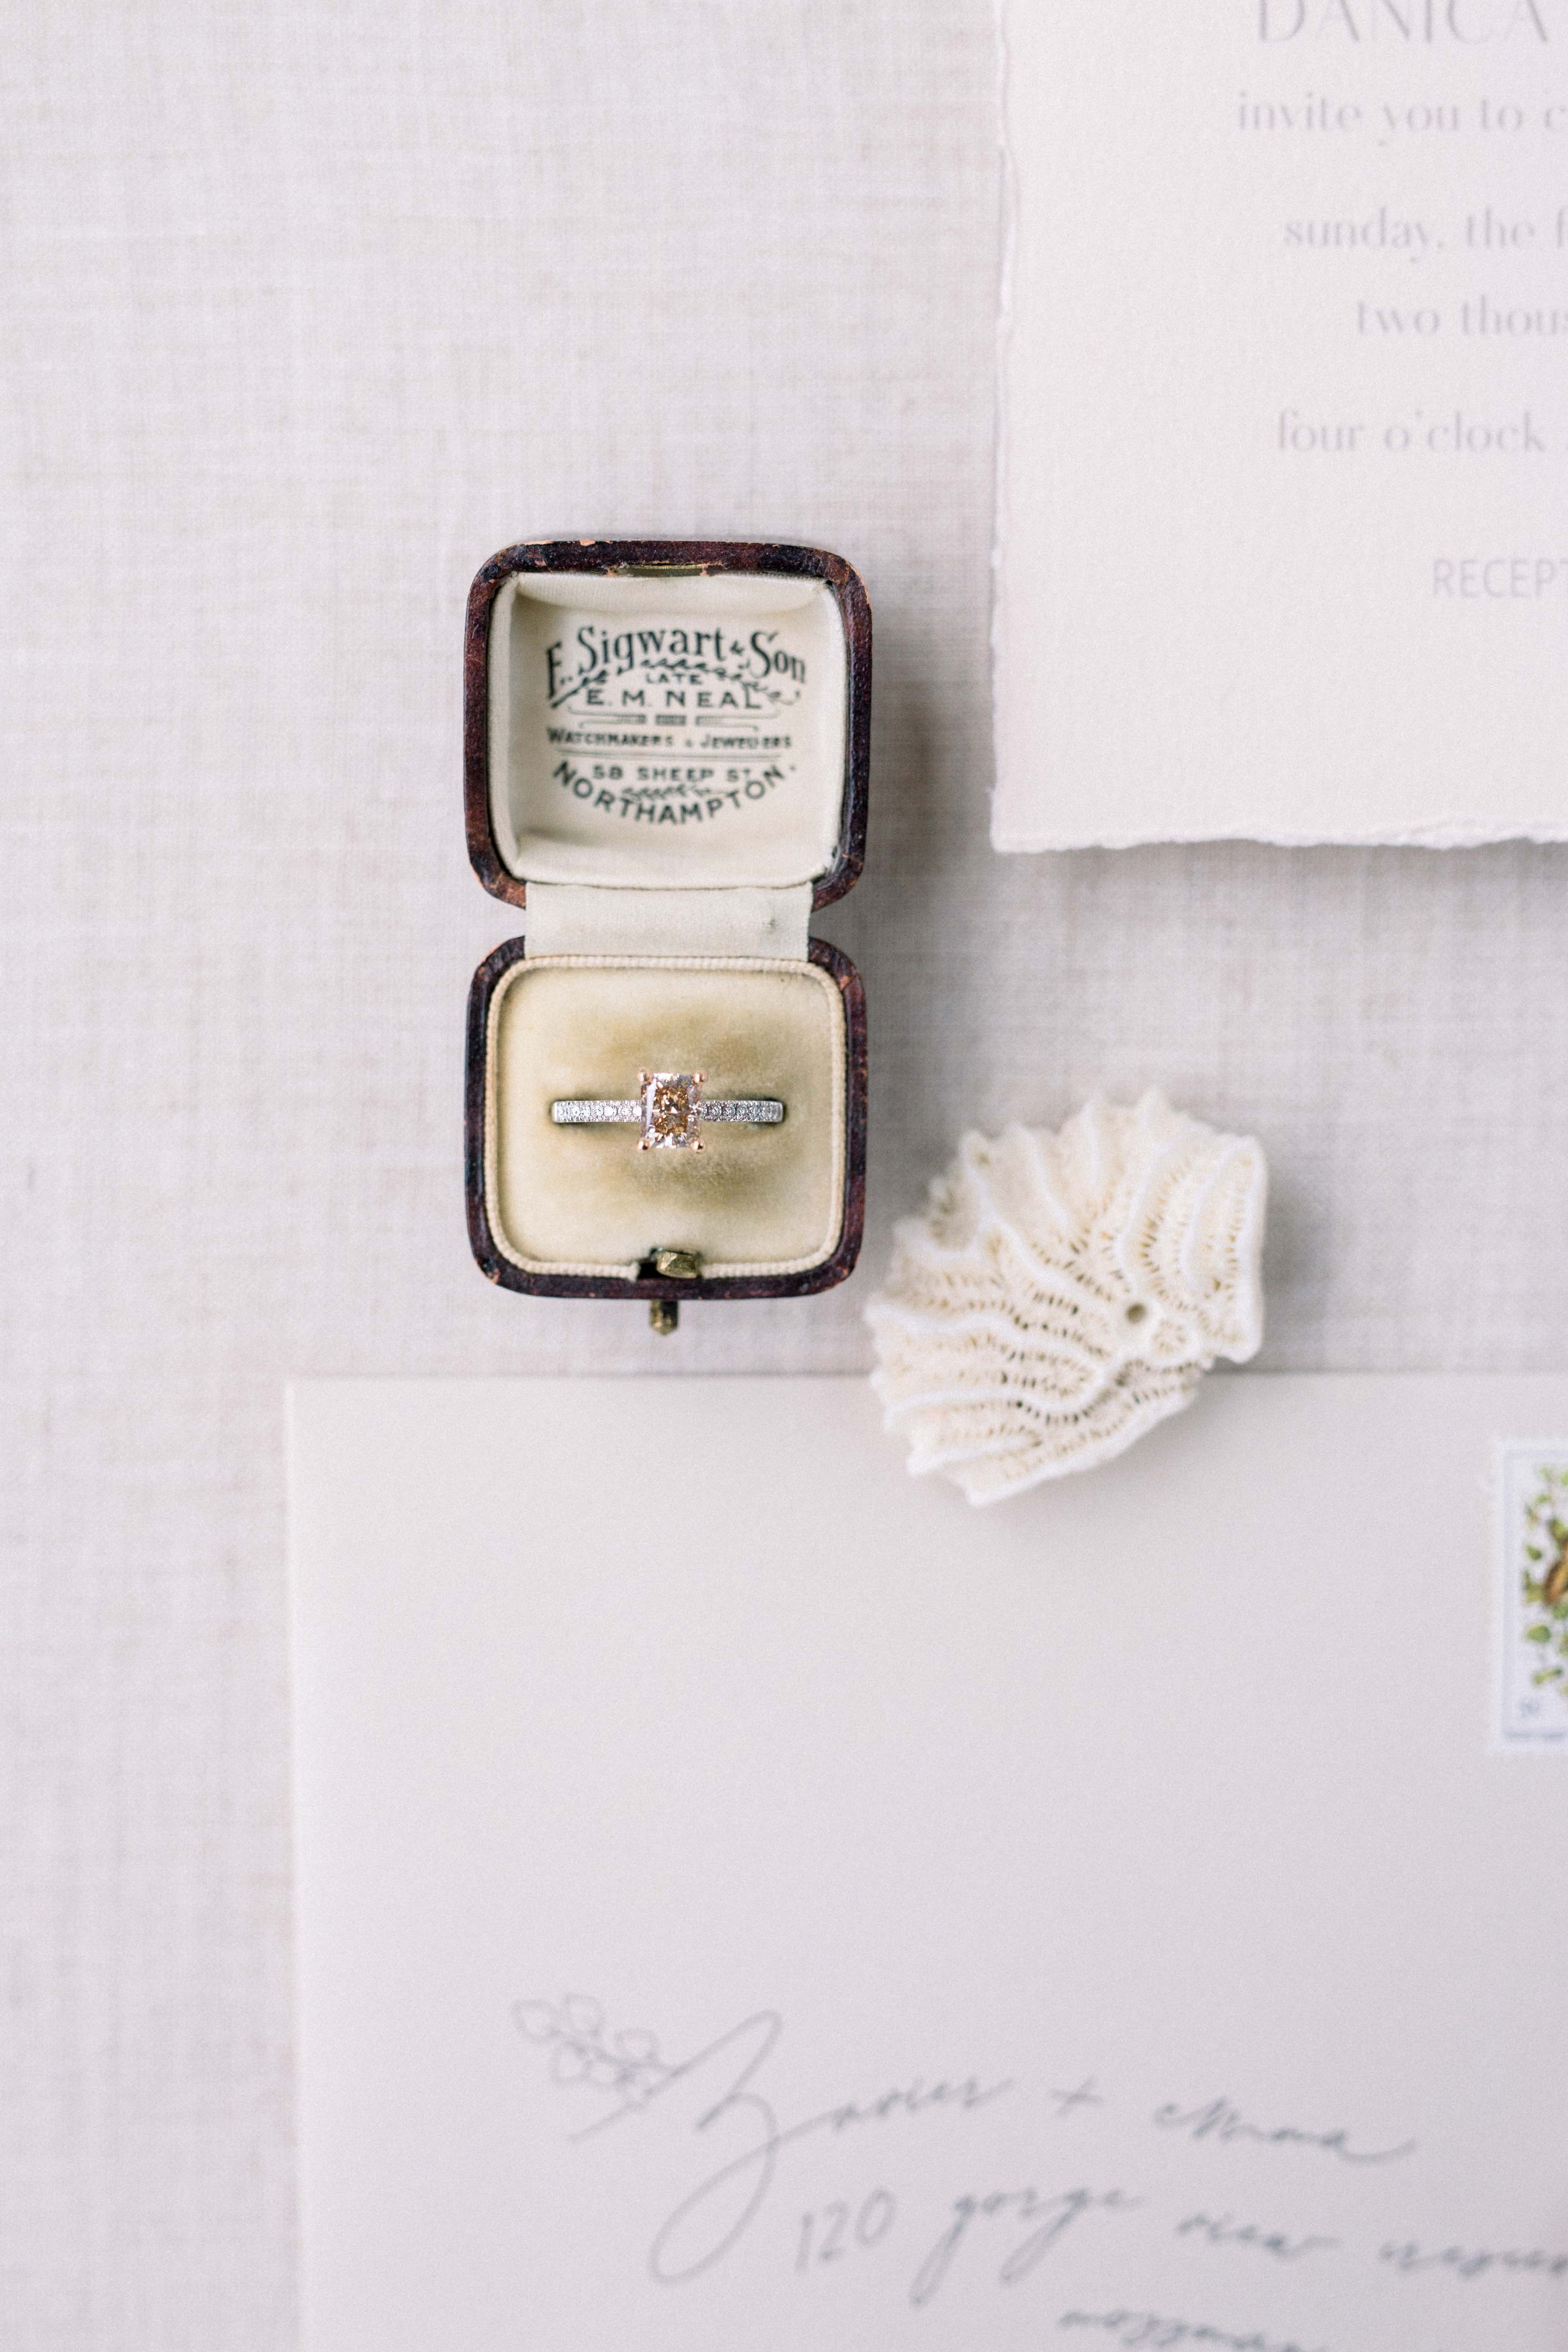 FremantleWeddingWalk-BlueHQ-WeddingStationary-TessaKitPhotography-JQ9A8369.jpg